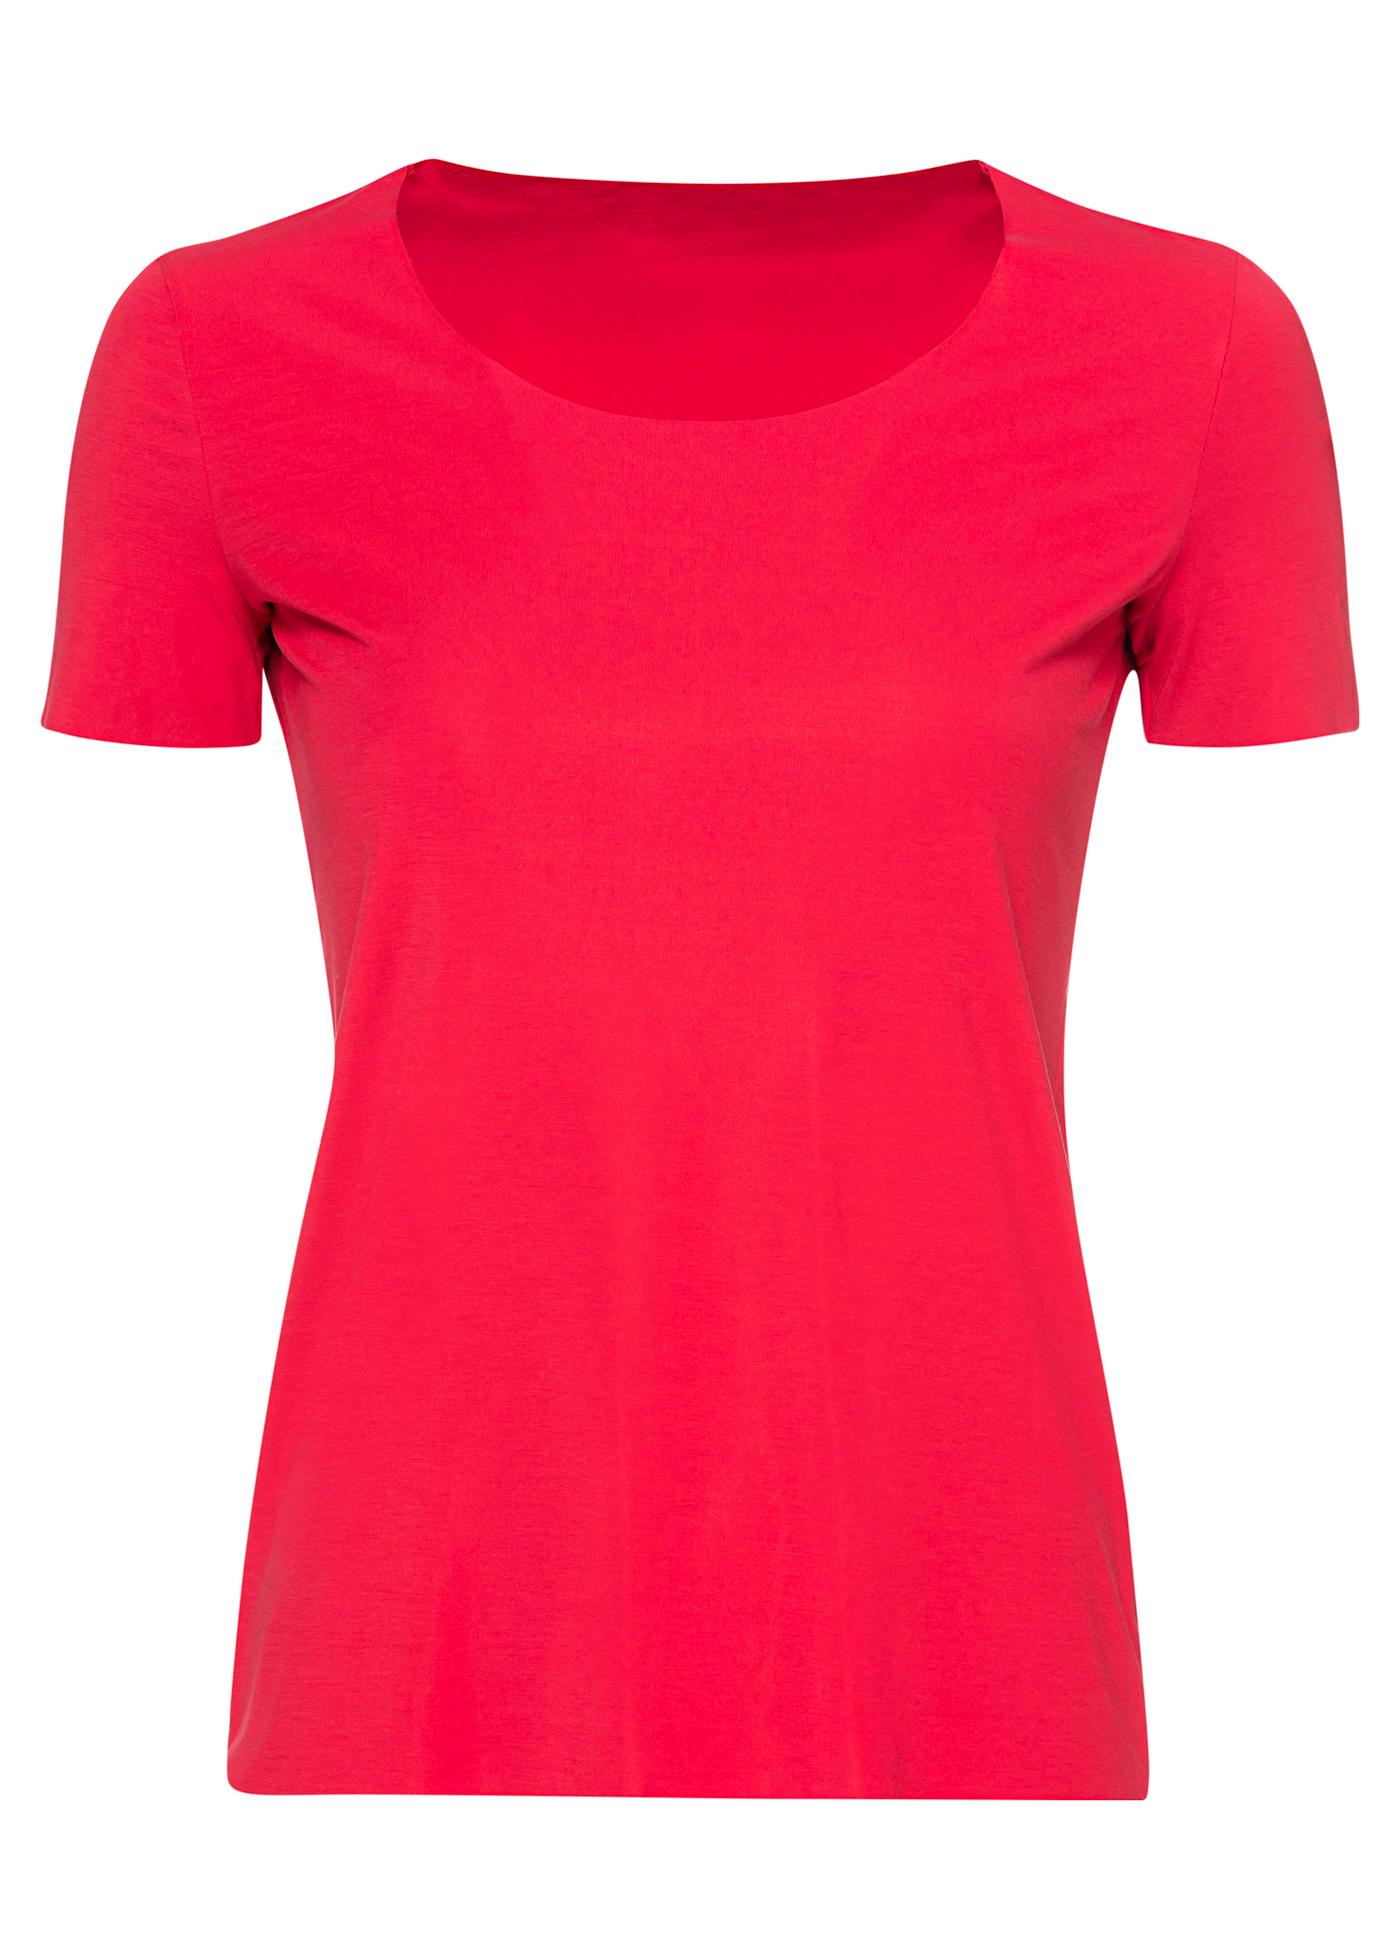 Aurora Pure Shirt image number 0